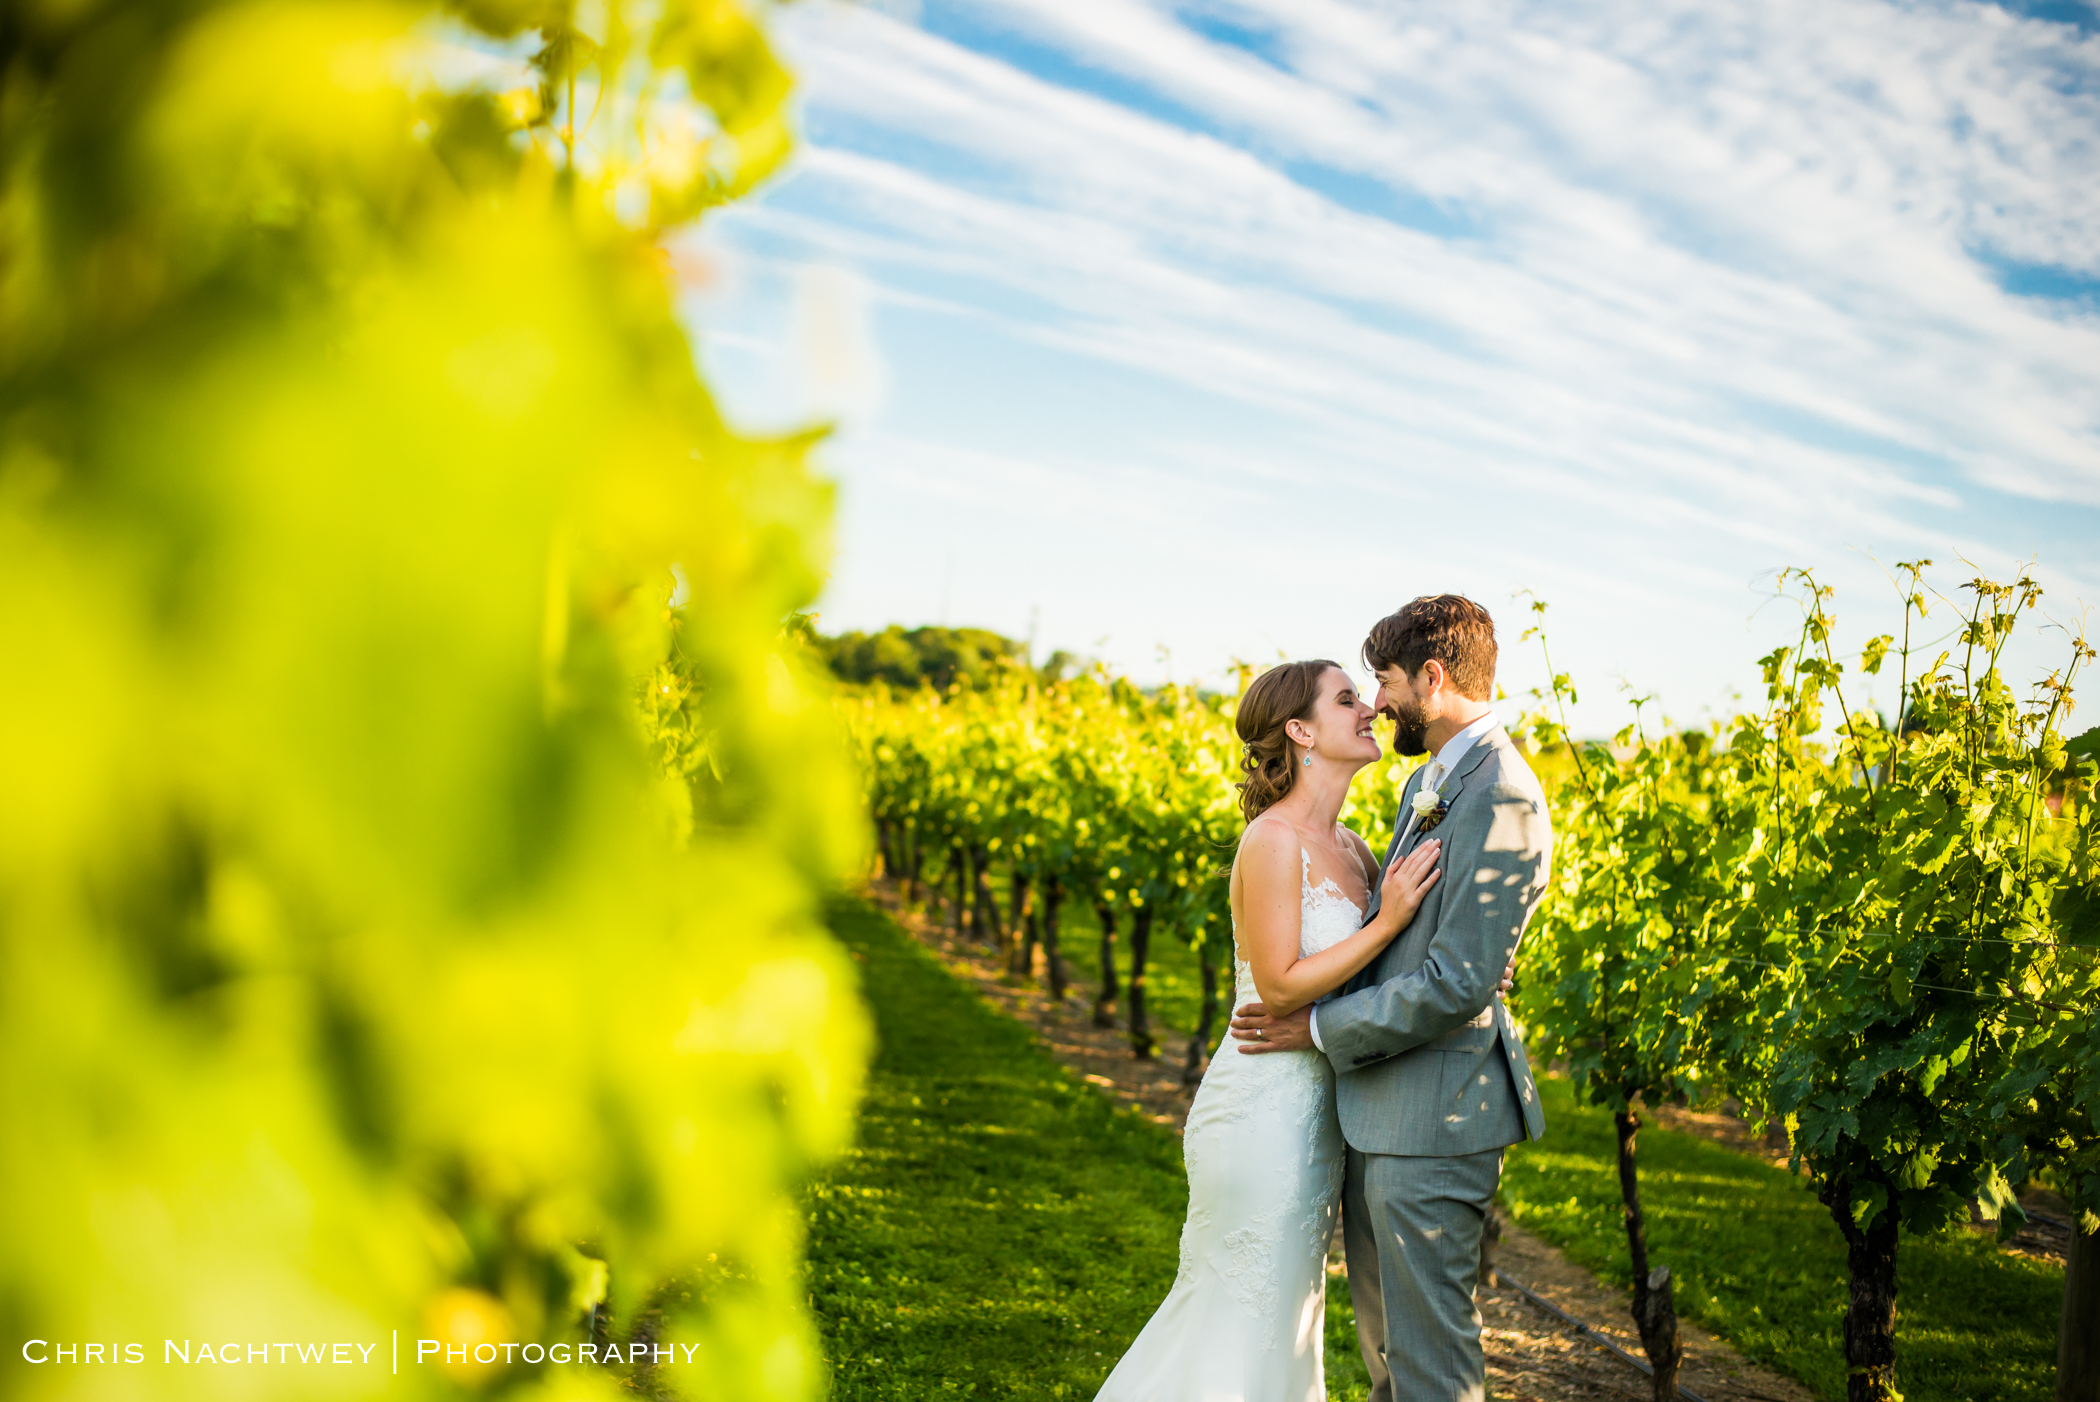 artistic-ct-wedding-photographers-chris-nachtwey-2017-104.jpg